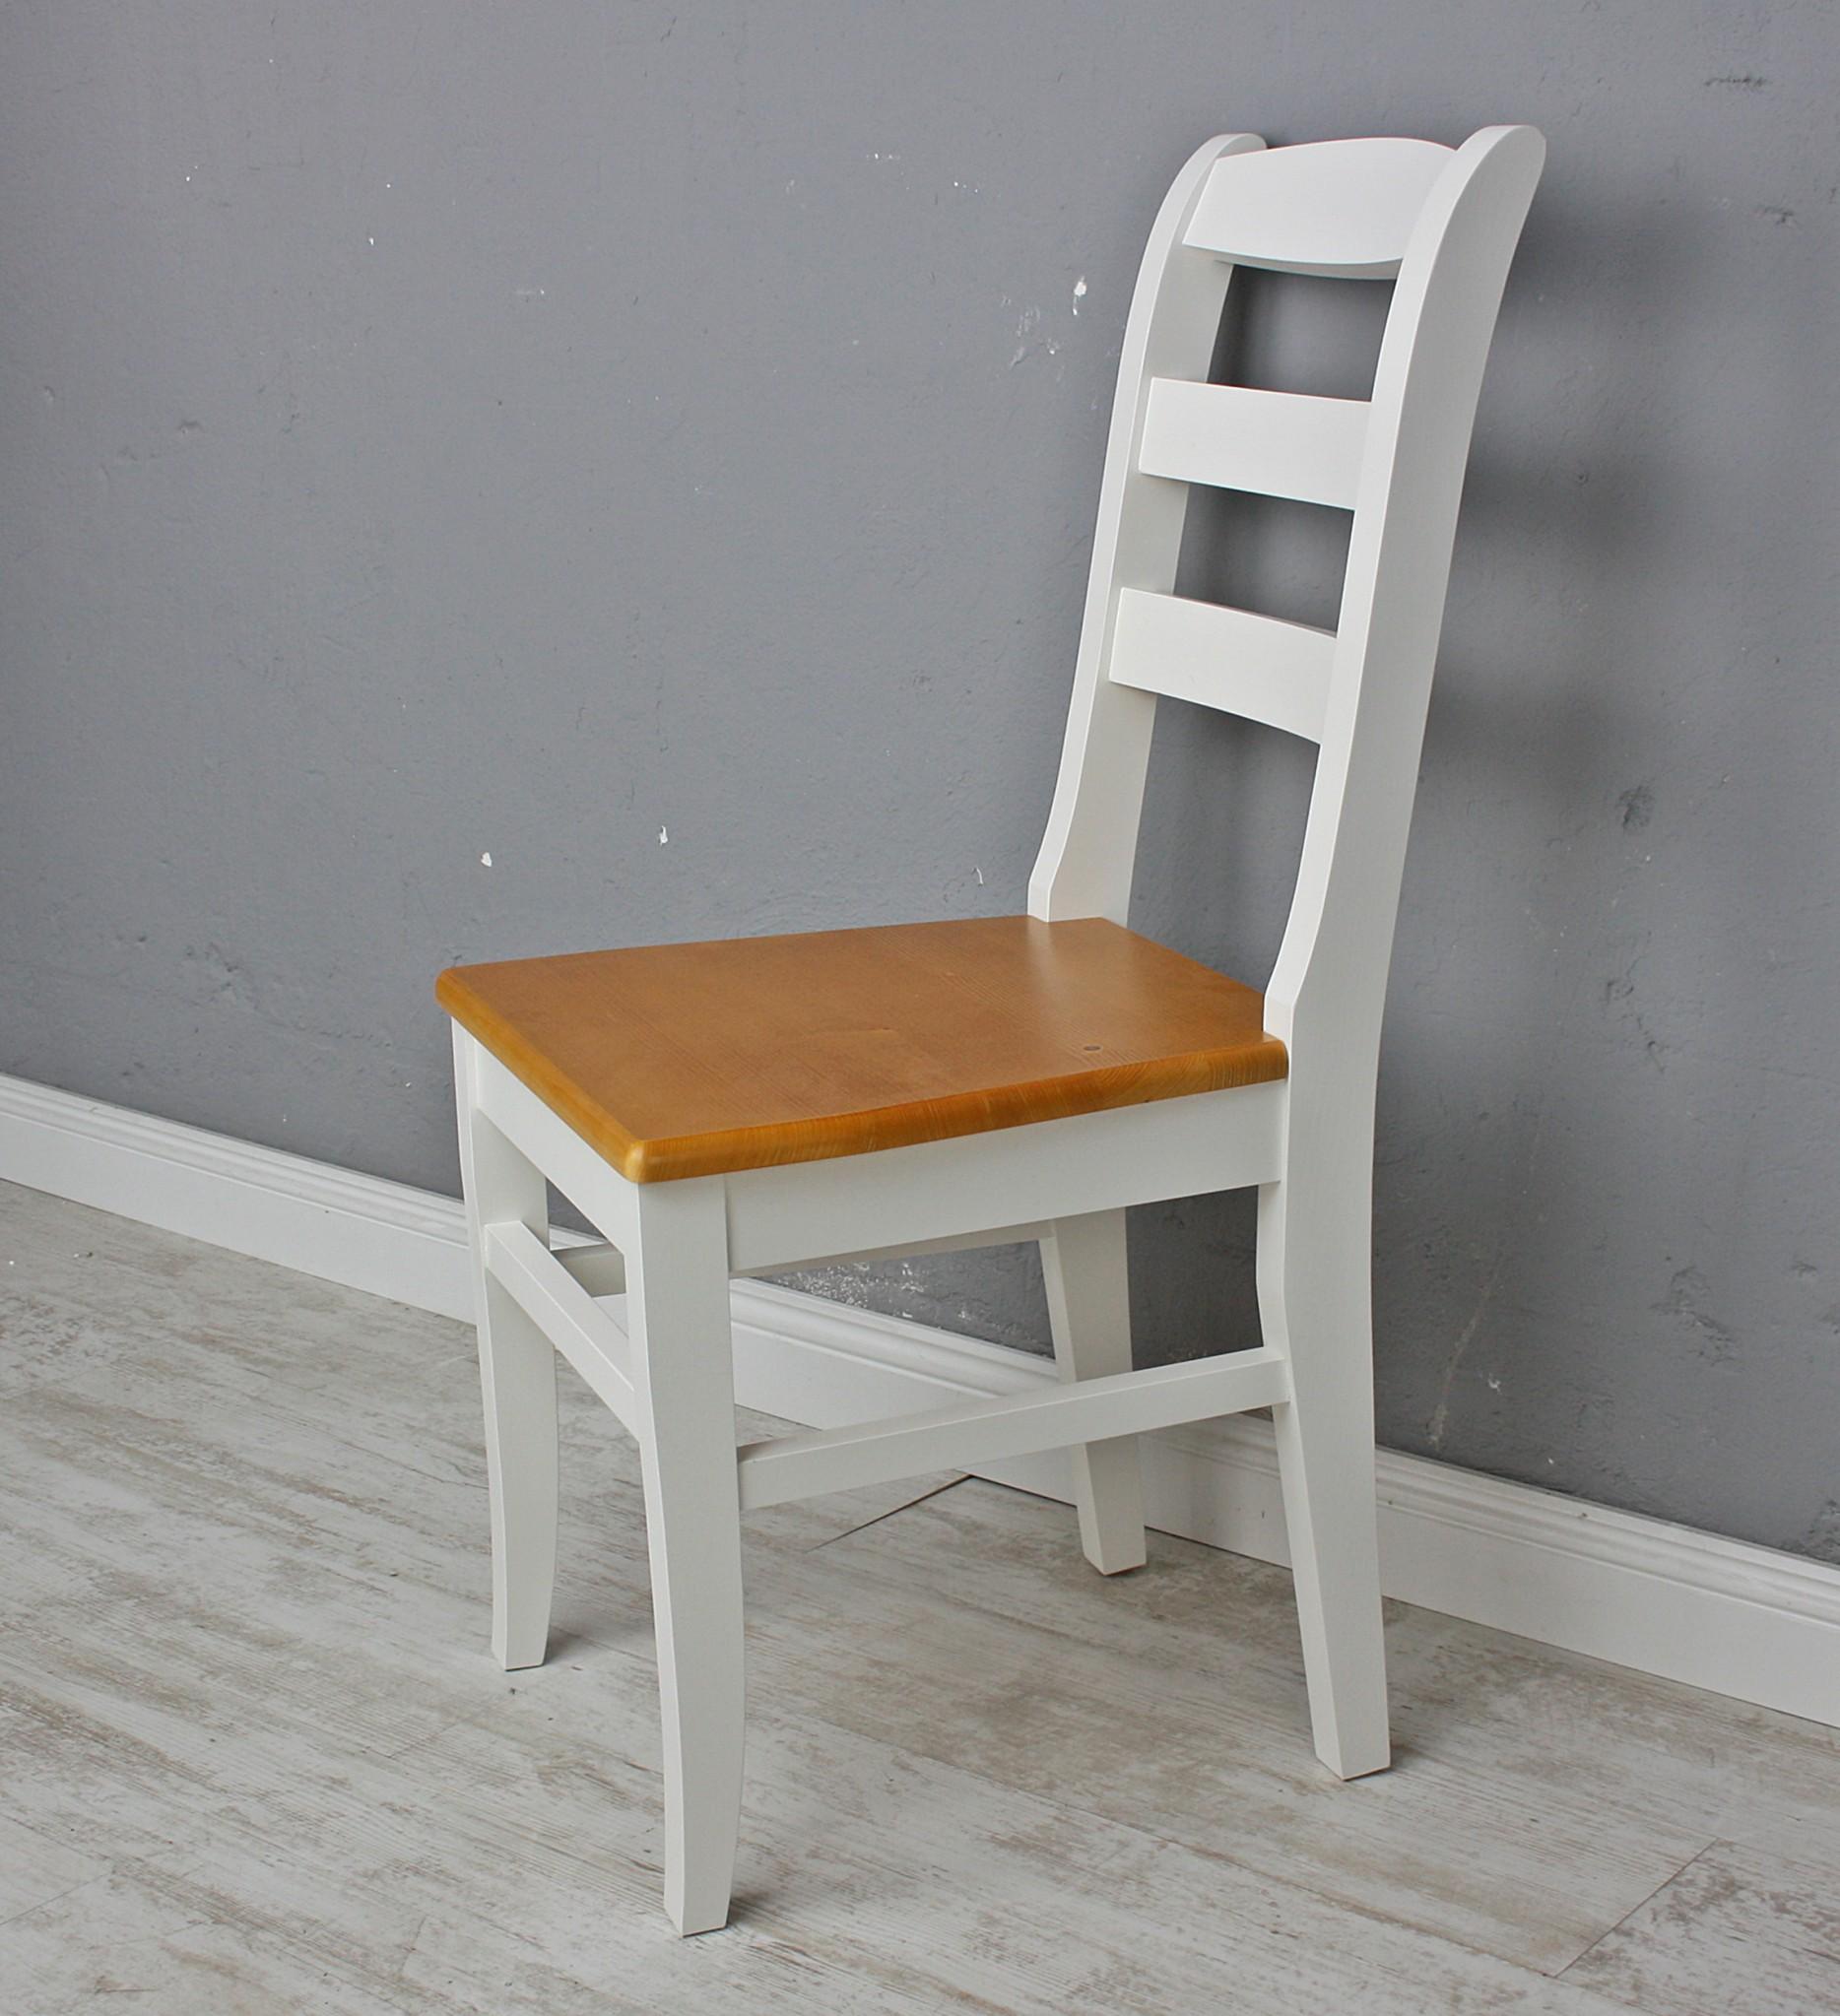 holzstuhl wei braun lena massiv. Black Bedroom Furniture Sets. Home Design Ideas